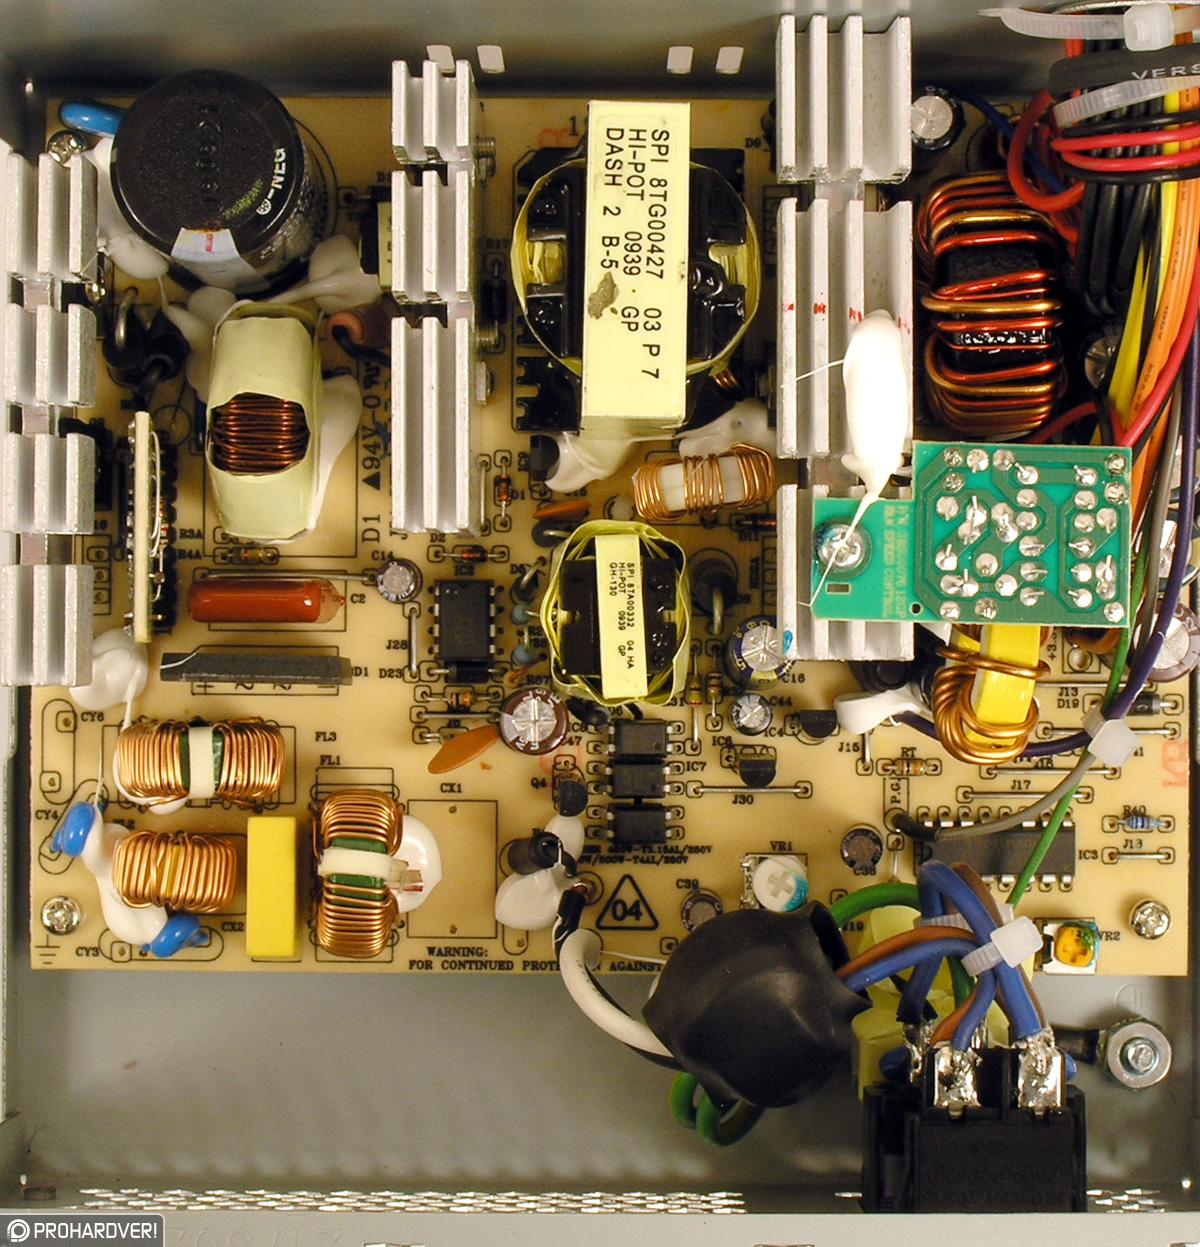 500 1 Enermax Revolution Xt 80 Gold Modular 530w Erx530awt 400 60apn